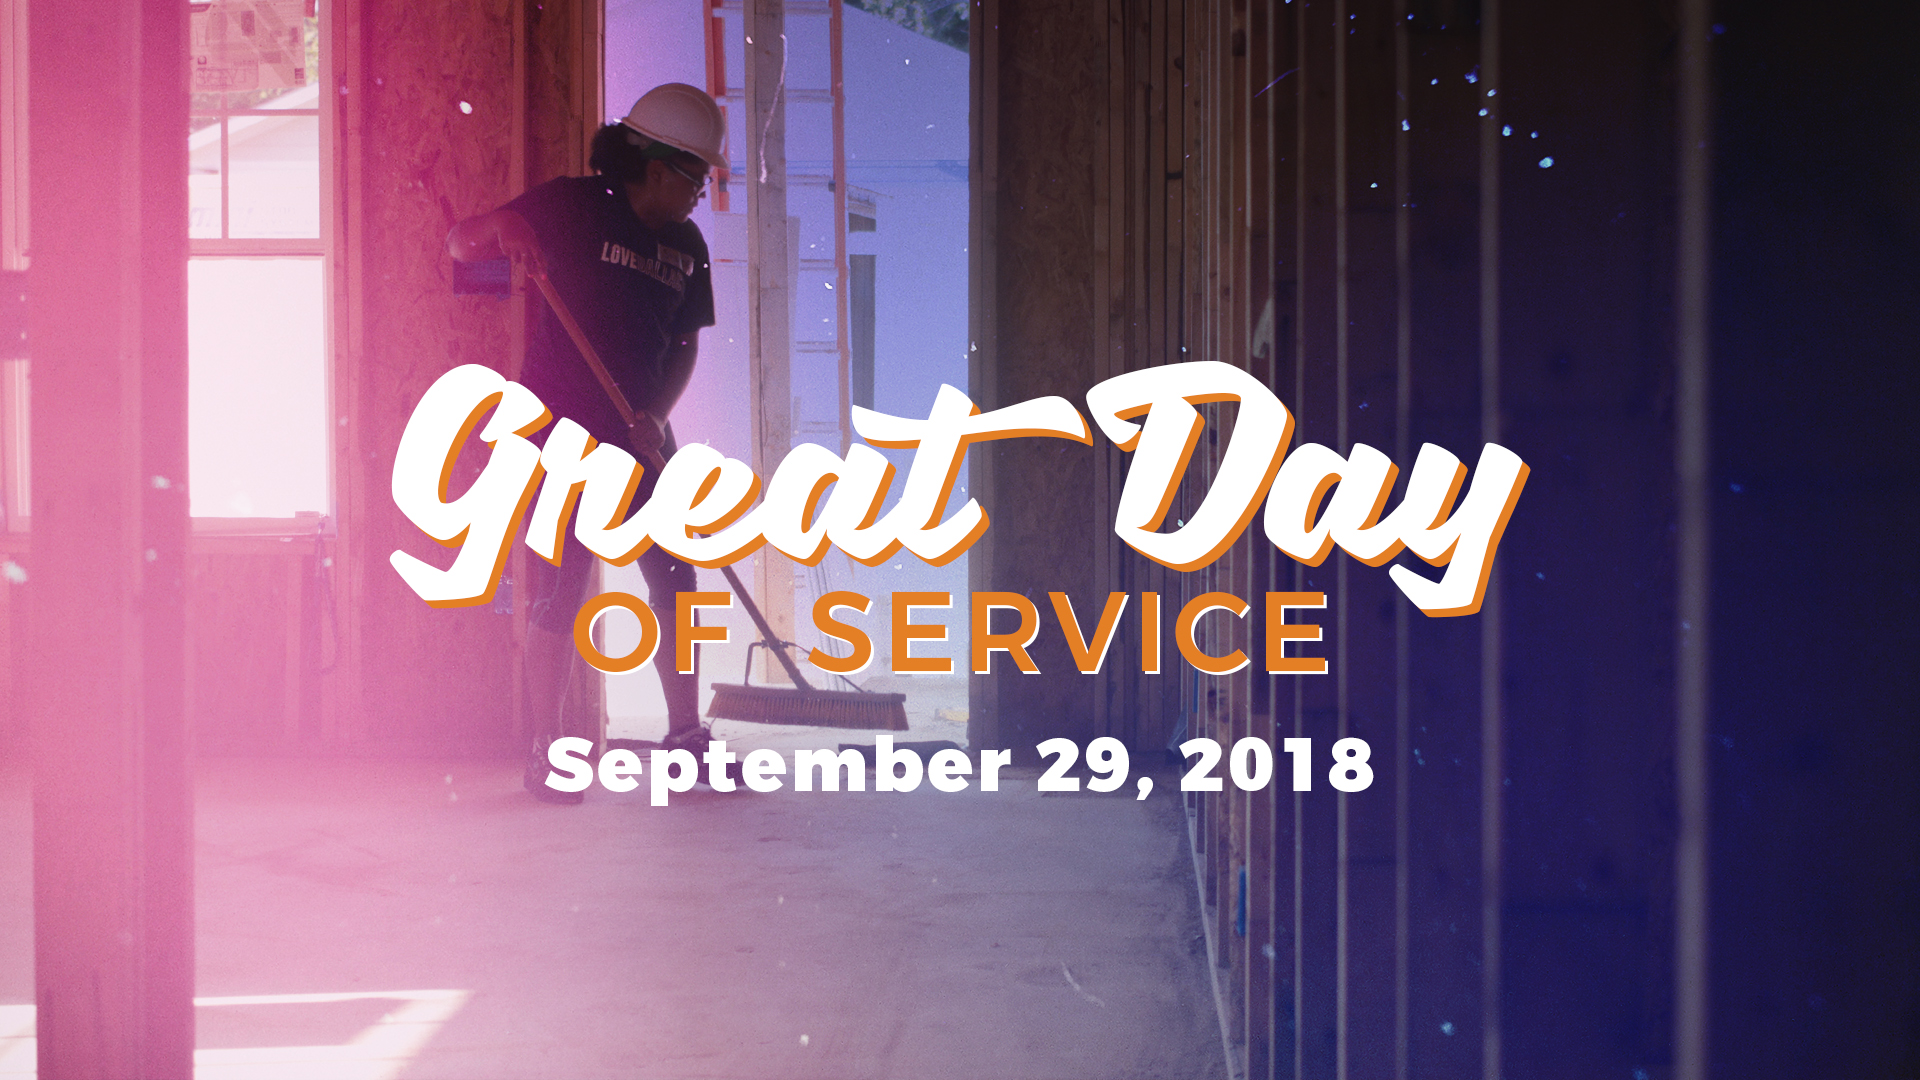 great day of service dallas church